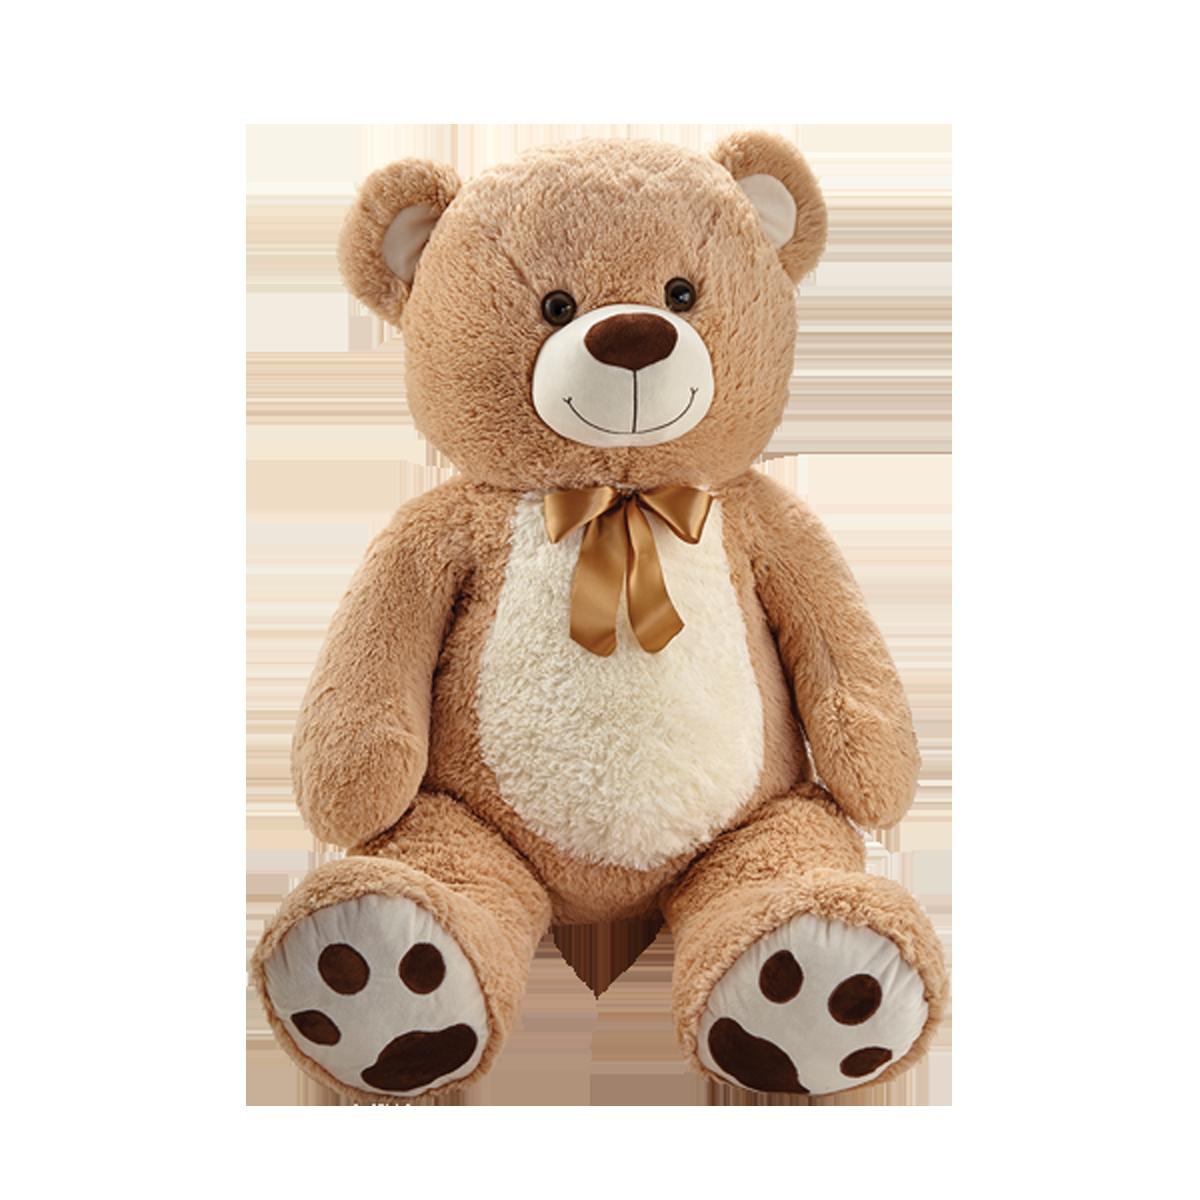 Snuggle Buddies Jumbo 125cm Henry Teddy Bear